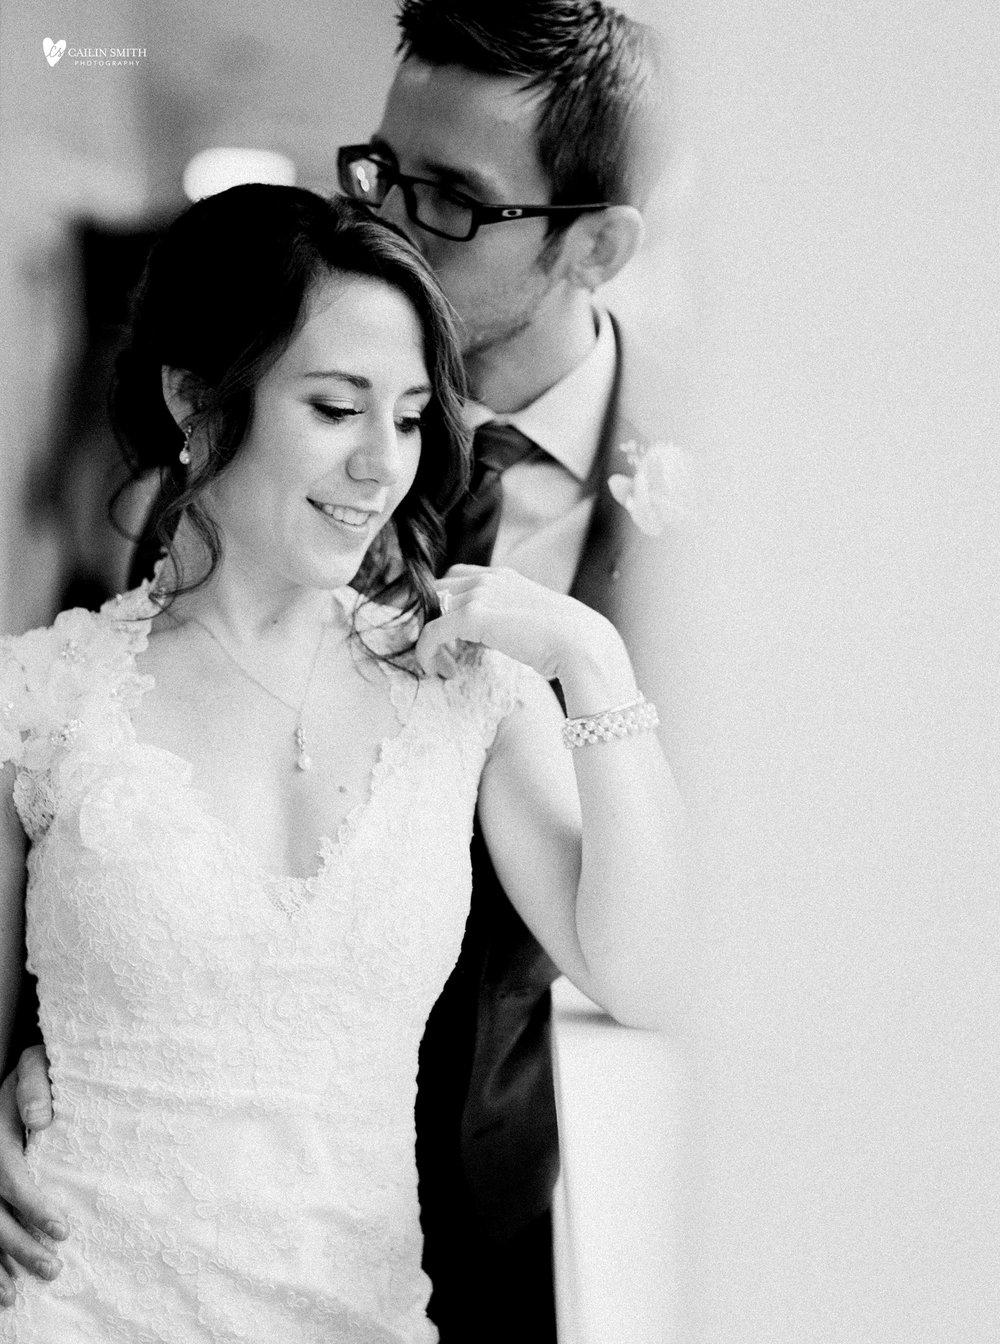 Shelby_Jeff_Ponte_Vedra_Hilltop_Club_Wedding_Photography_065.jpg